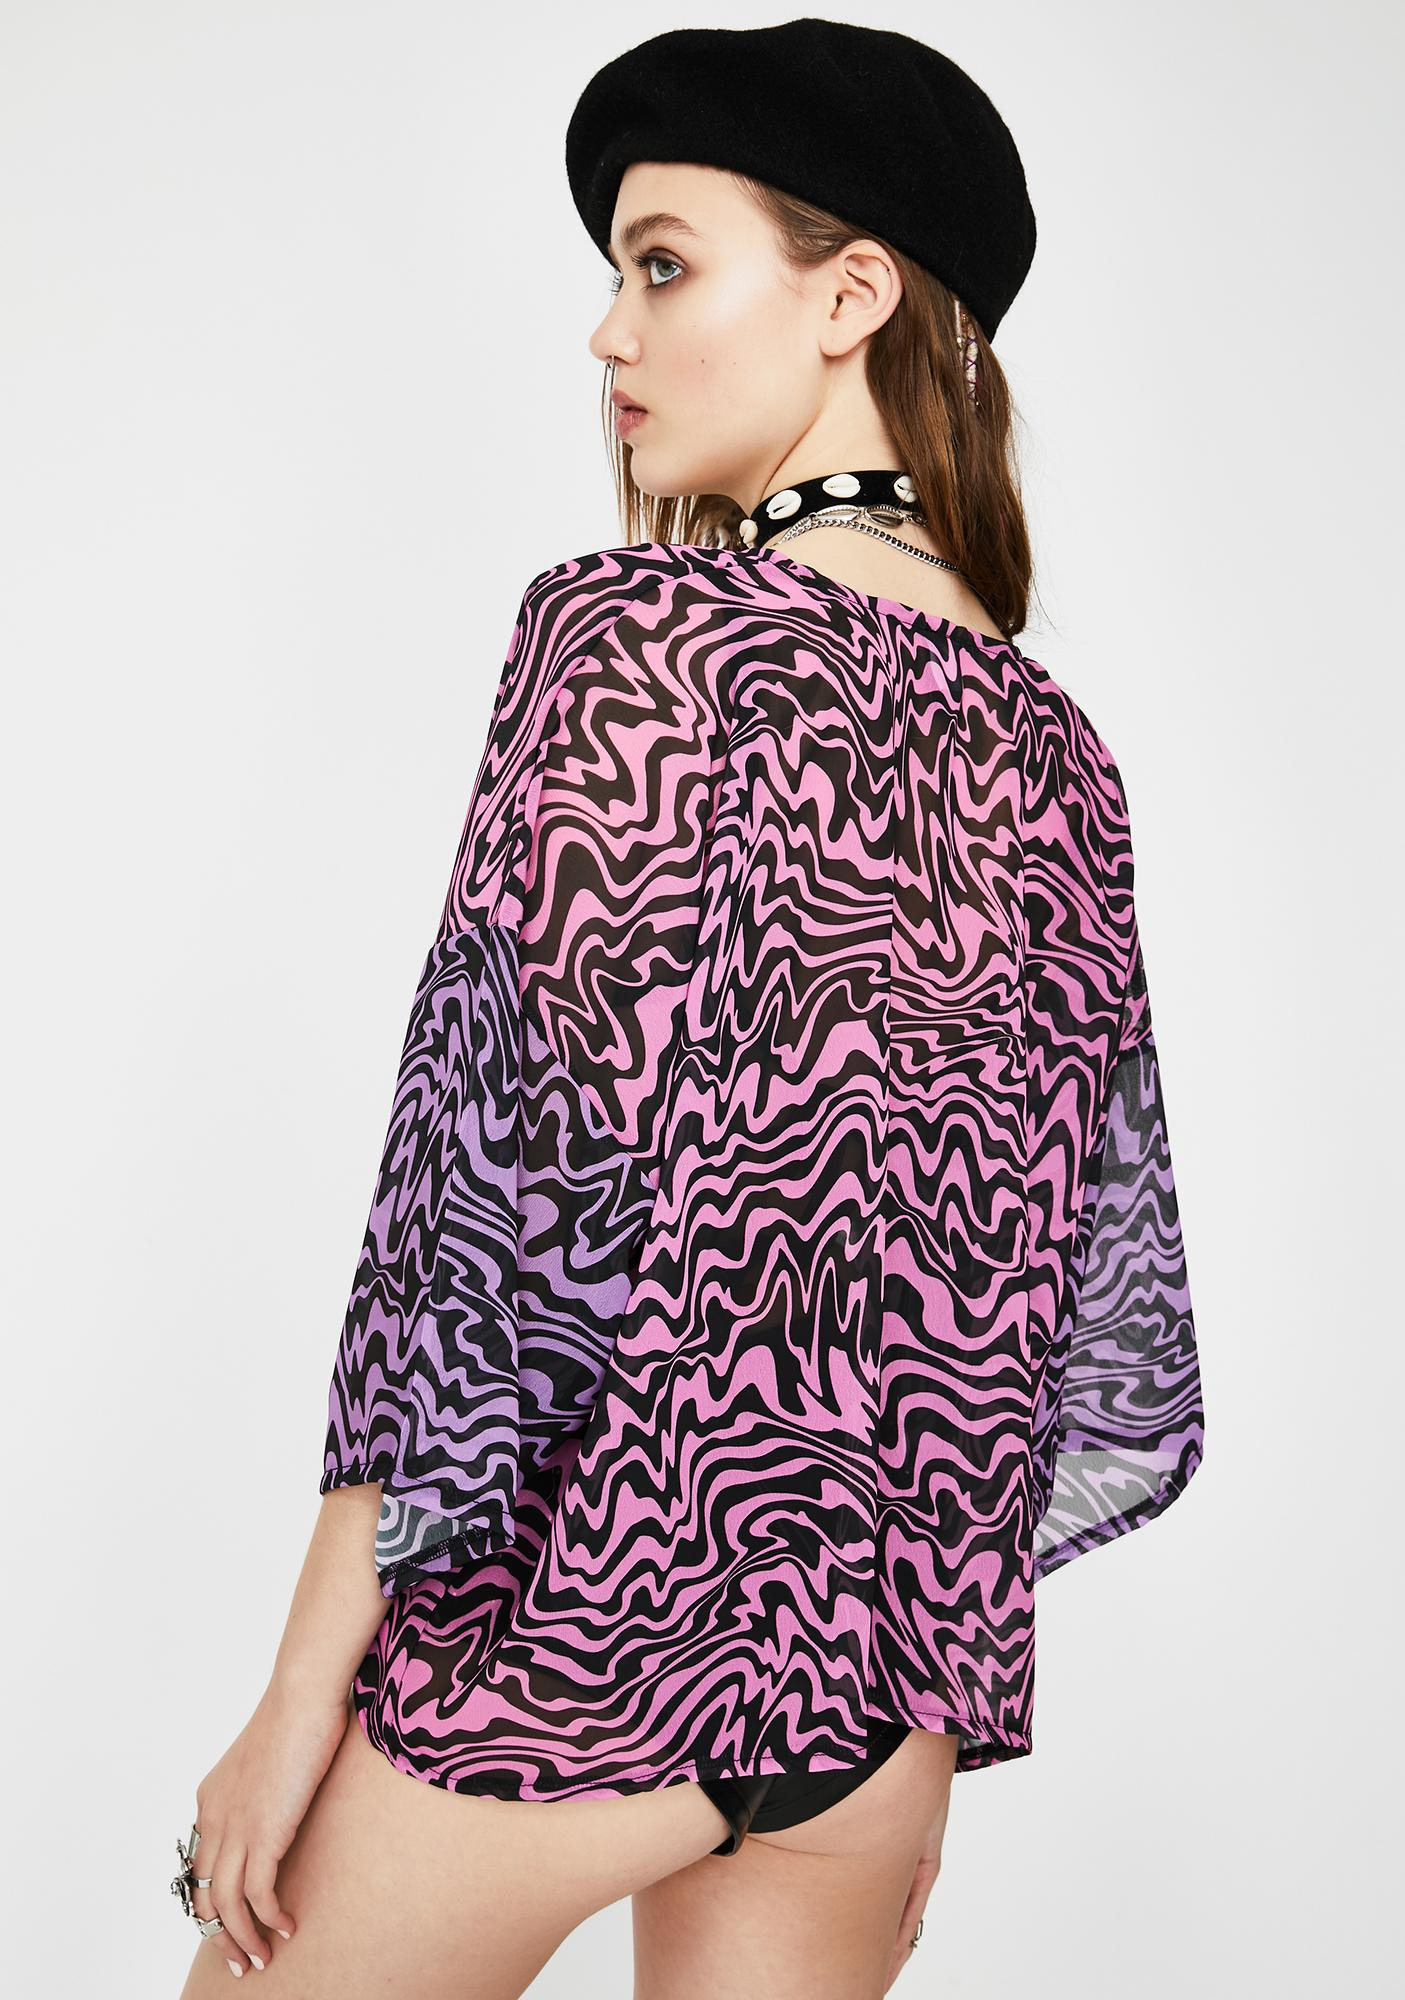 Tara Khorzad Trippy Pink Chiffon Kimono